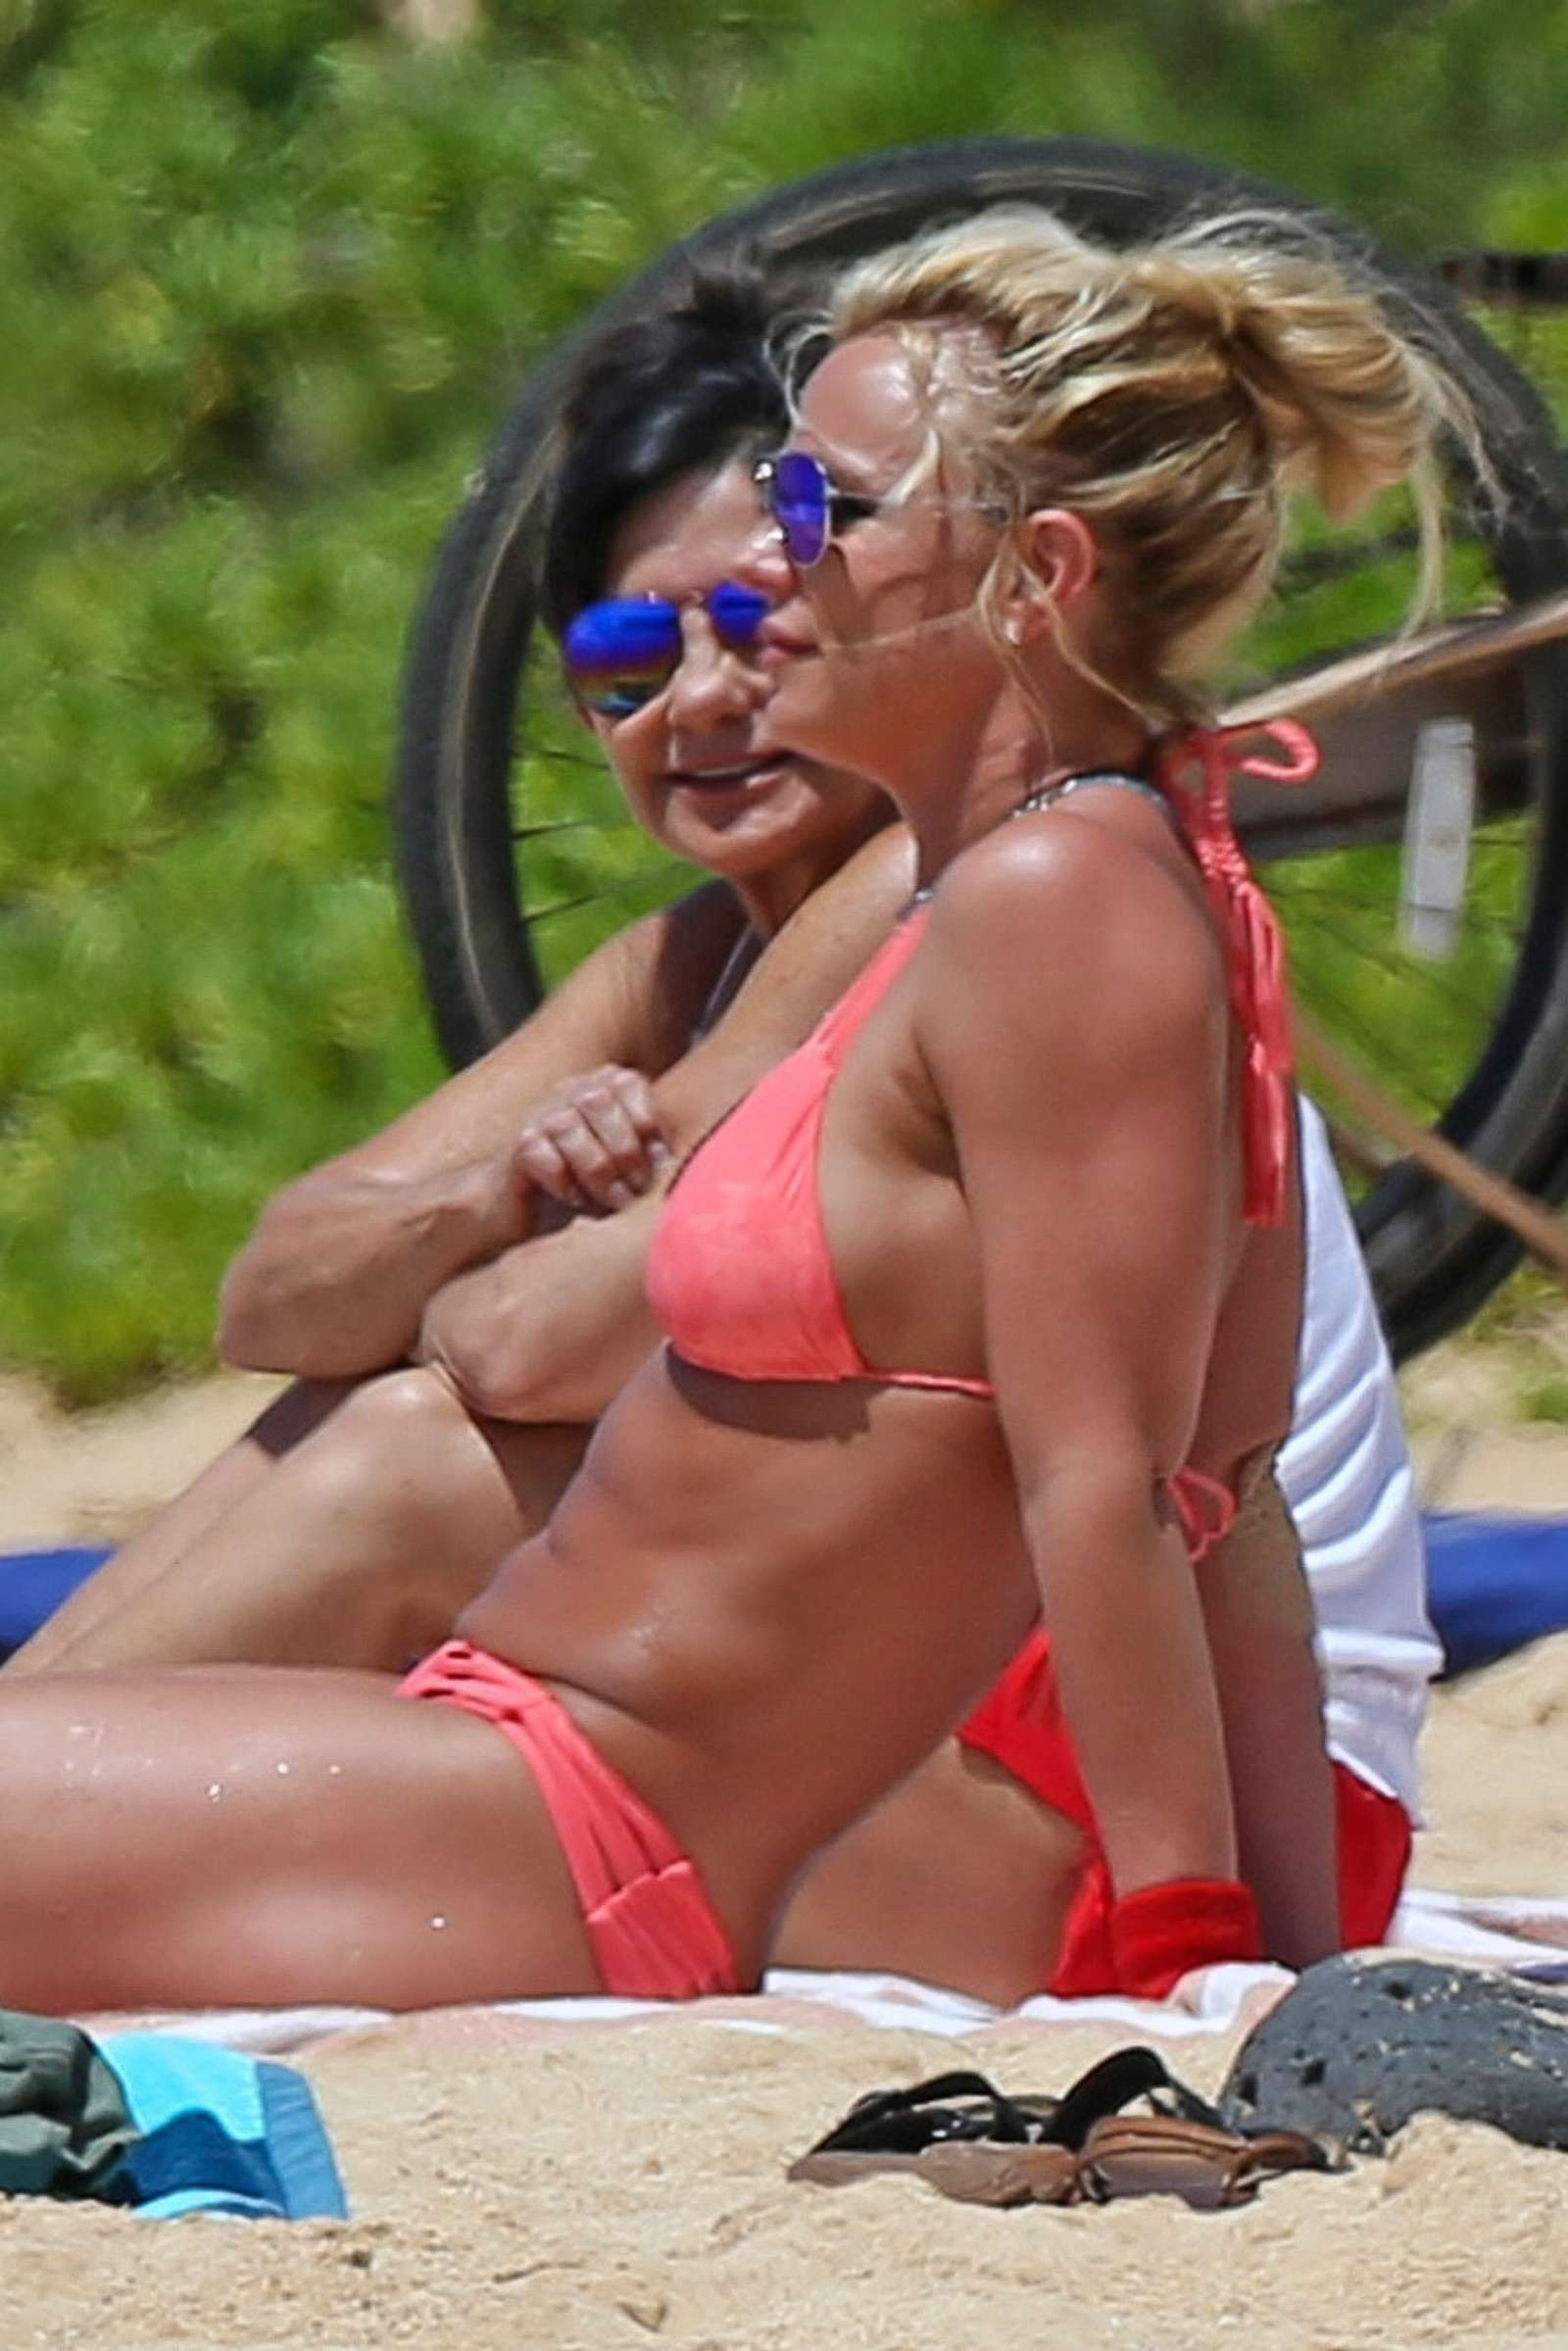 Alessandra ambrosio boobs in verdades secretas scandalplanet - 3 part 6